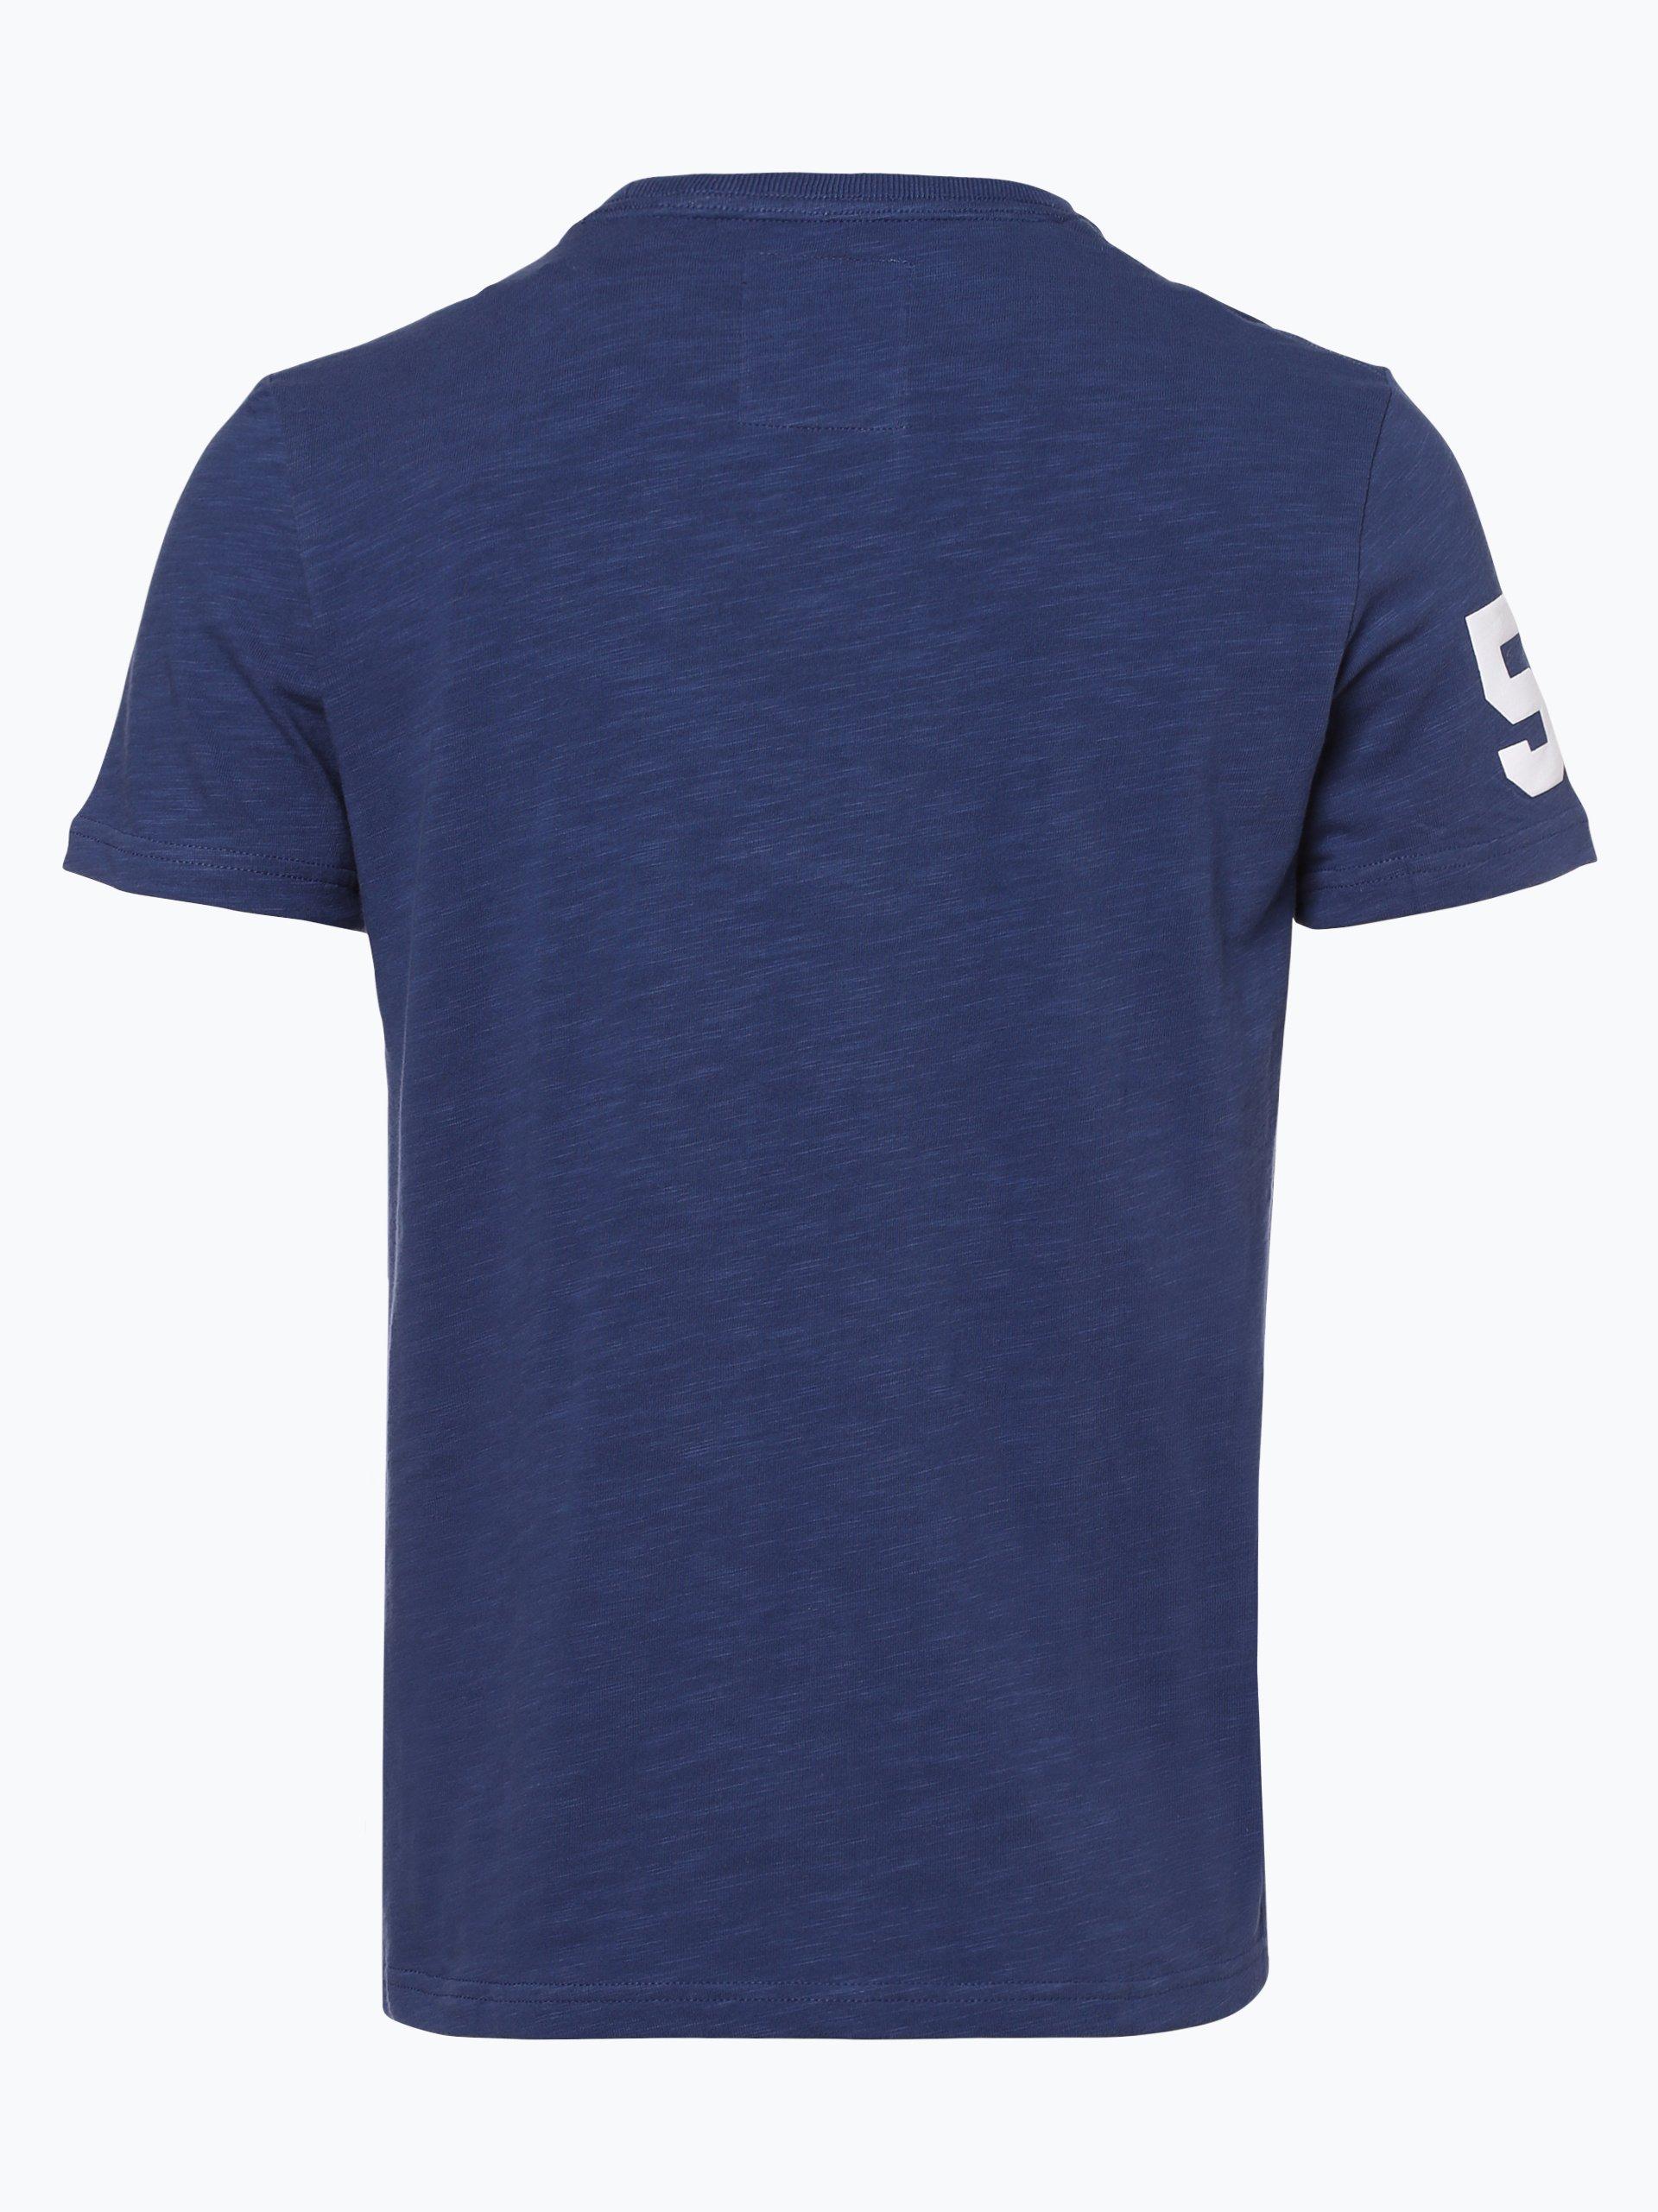 superdry herren t shirt royal bedruckt online kaufen peek und cloppenburg de. Black Bedroom Furniture Sets. Home Design Ideas